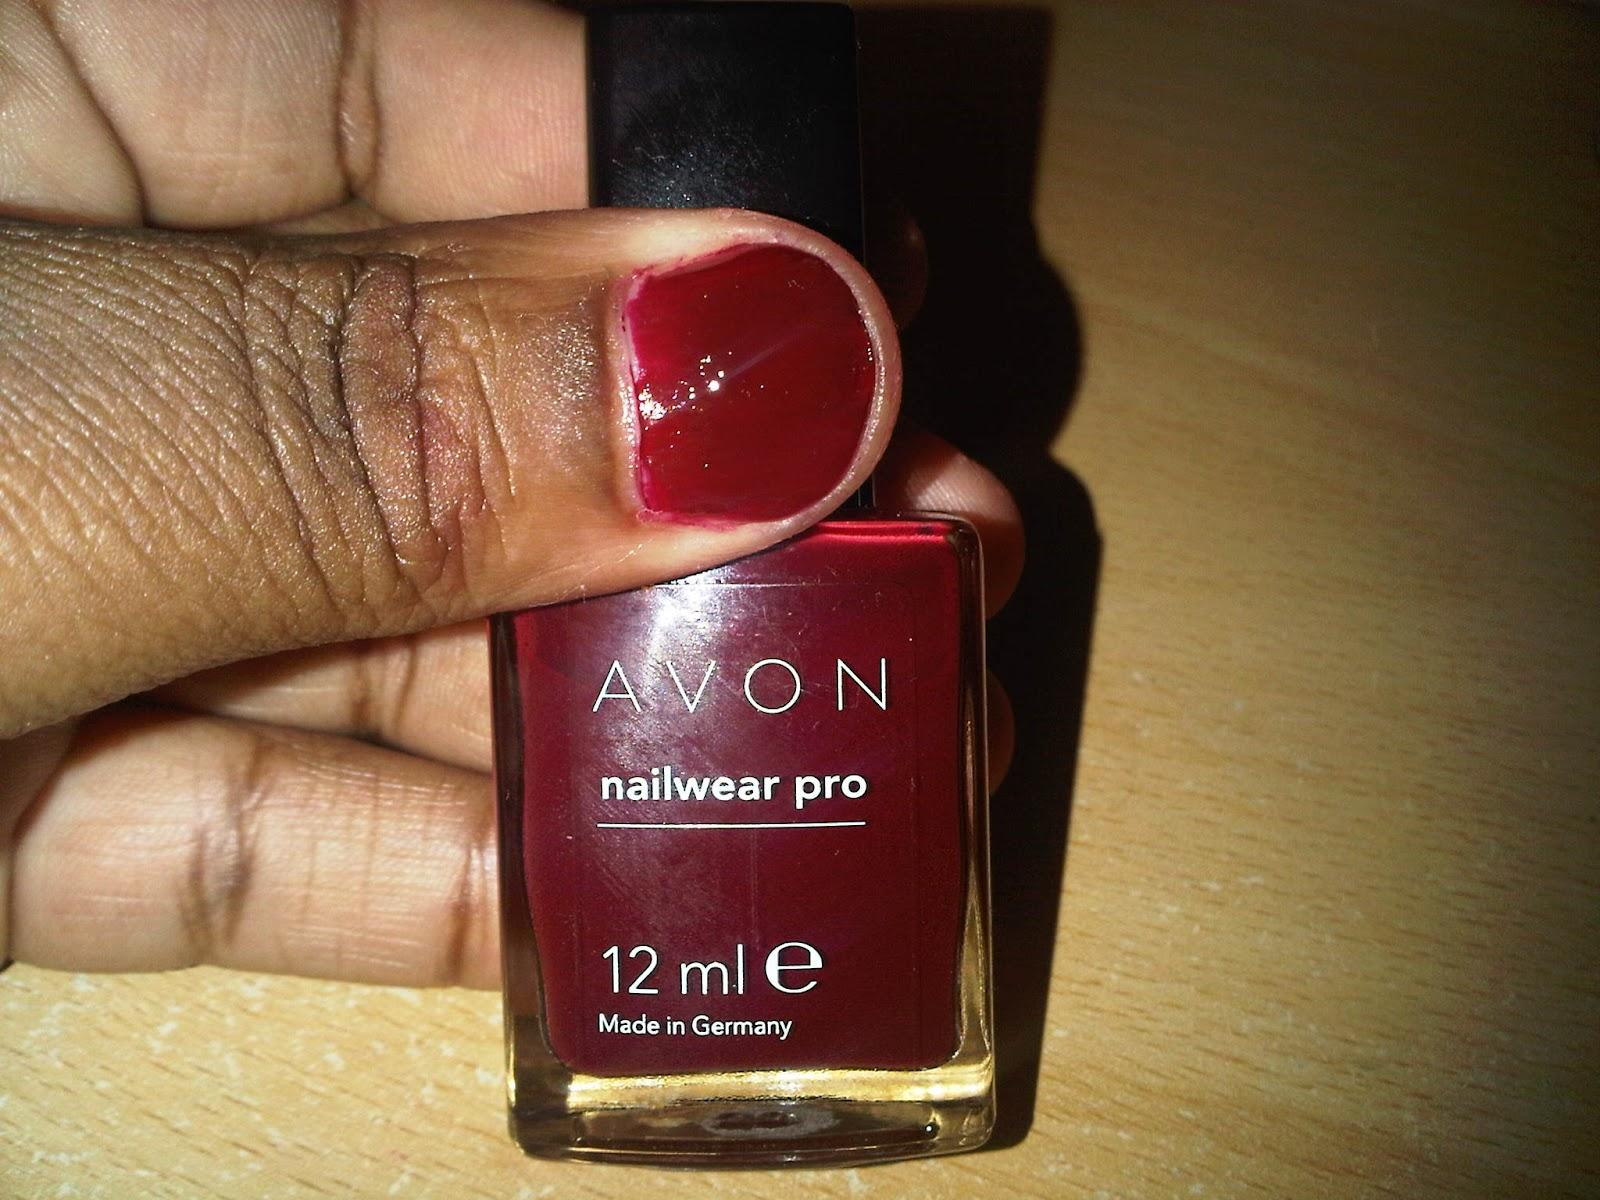 Sonya Loves Makeup: Avon Haul C10